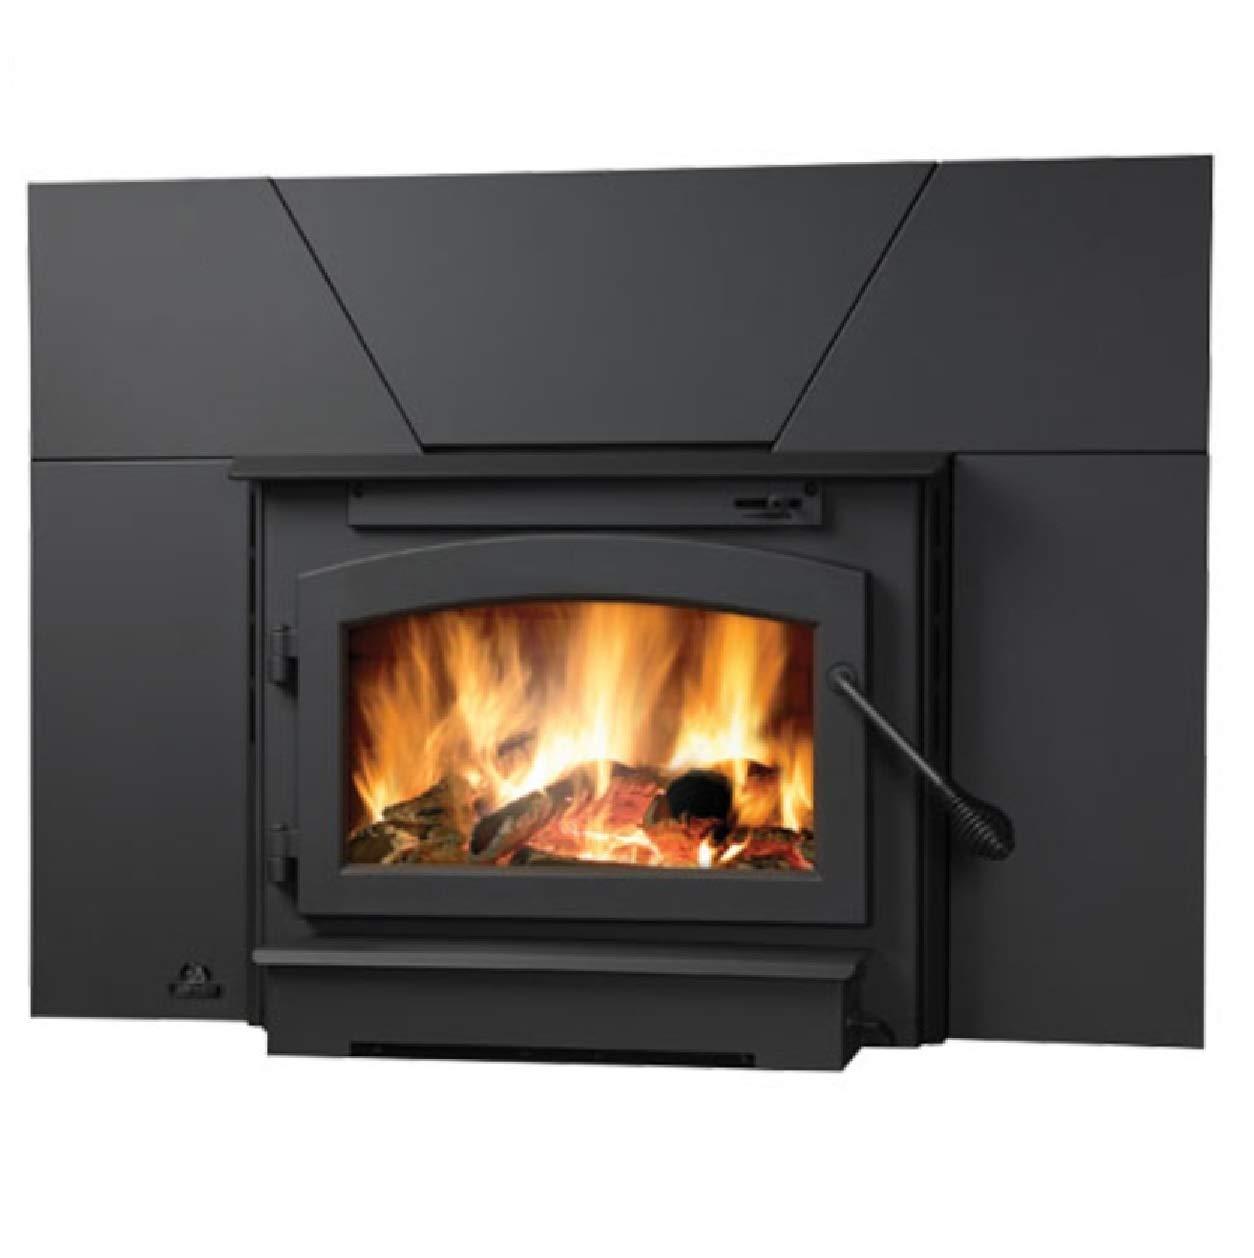 Timberwolf Economizer Burning Fireplace Insert